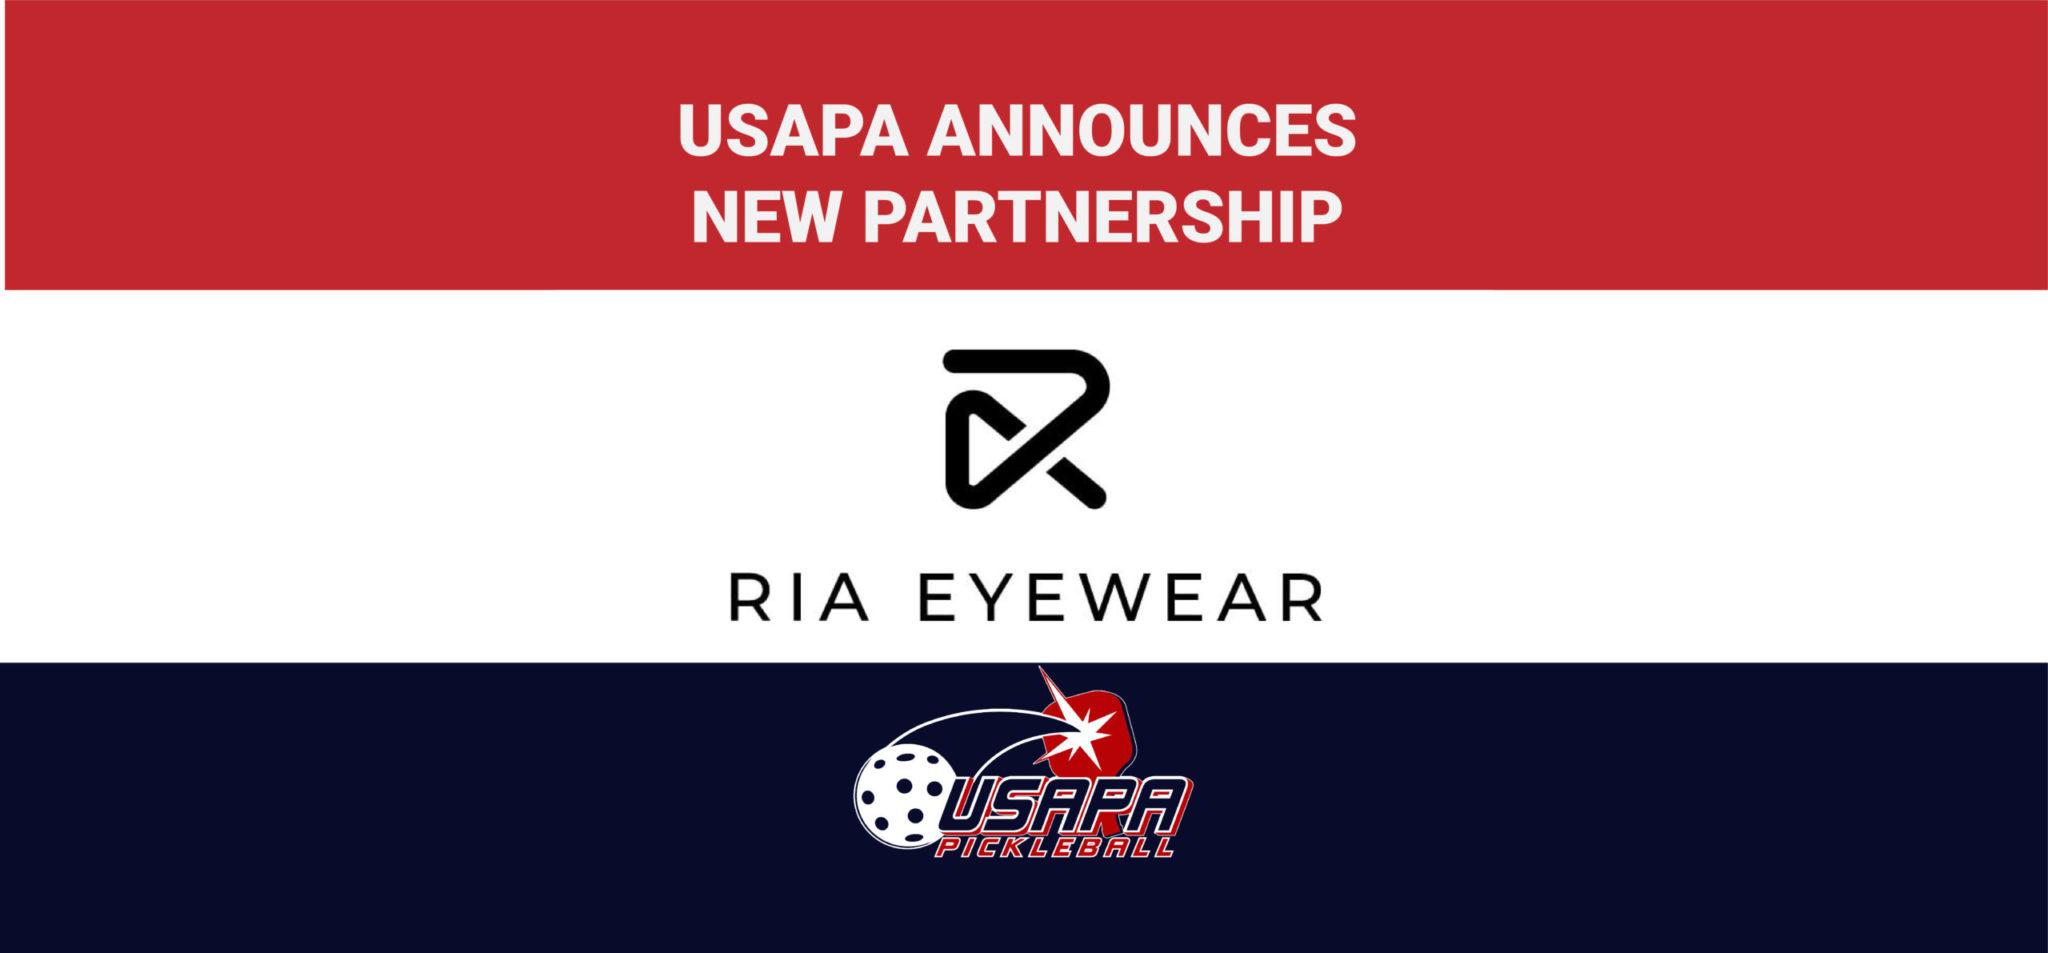 RIA eyewear USAPA 2